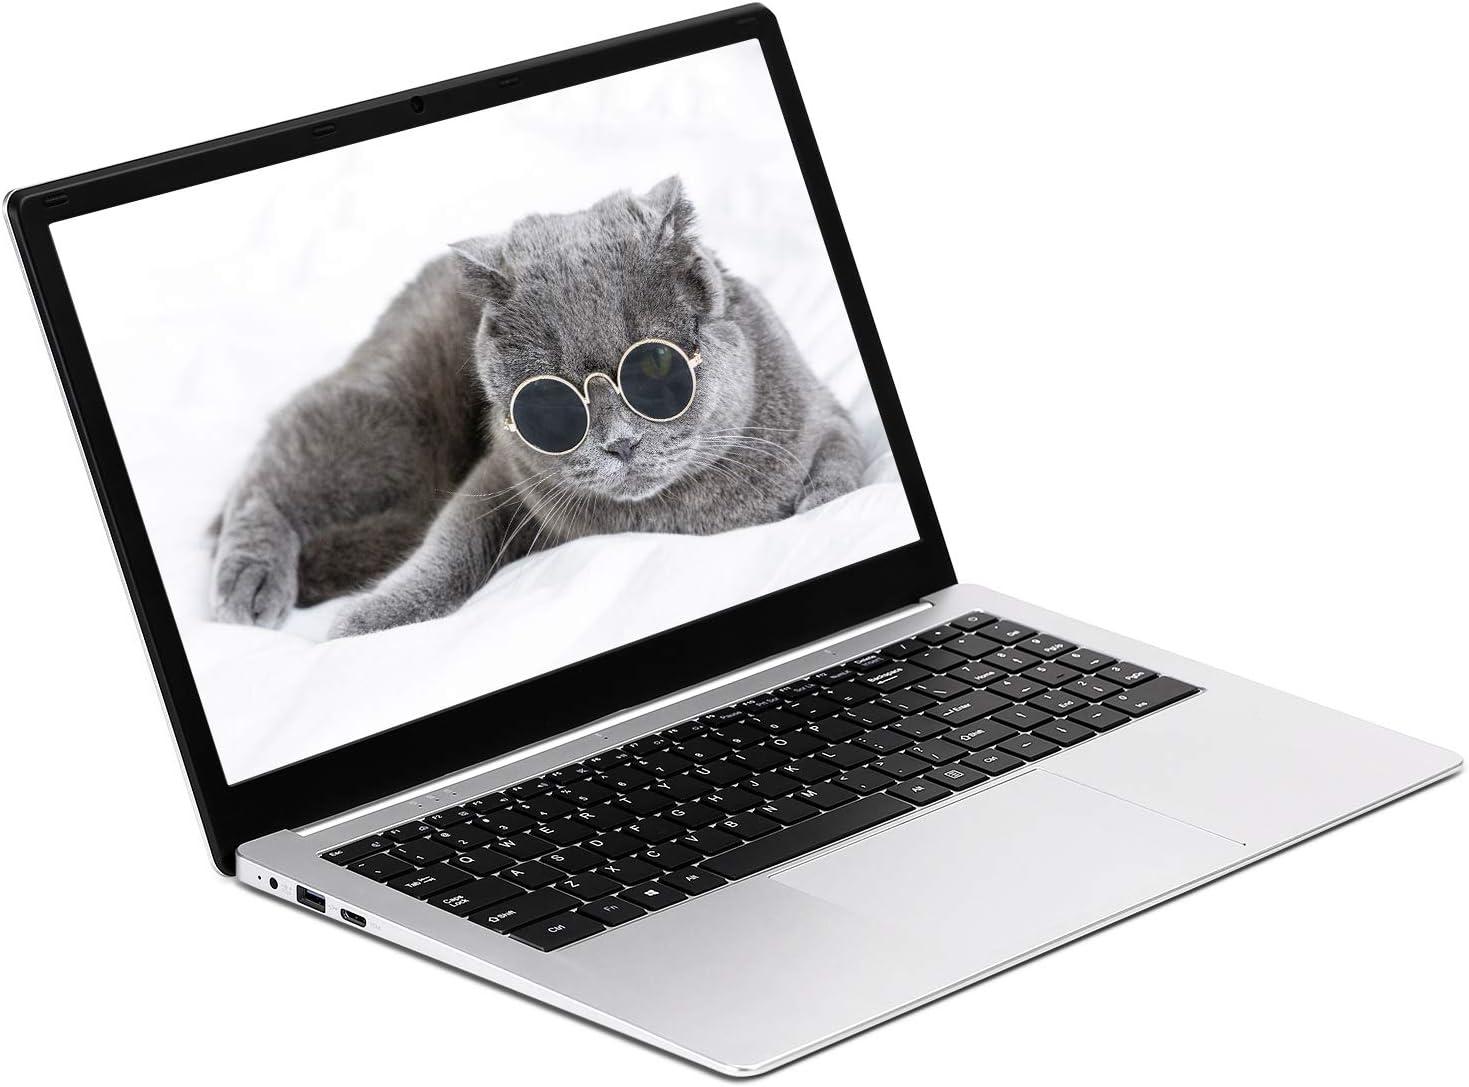 Laptop 15.6 inch, 1920x1080 high-Definition Display, Intel j3455/J4115 CPU. 8G RAM,256G SSD,Windows 10(Silvery)